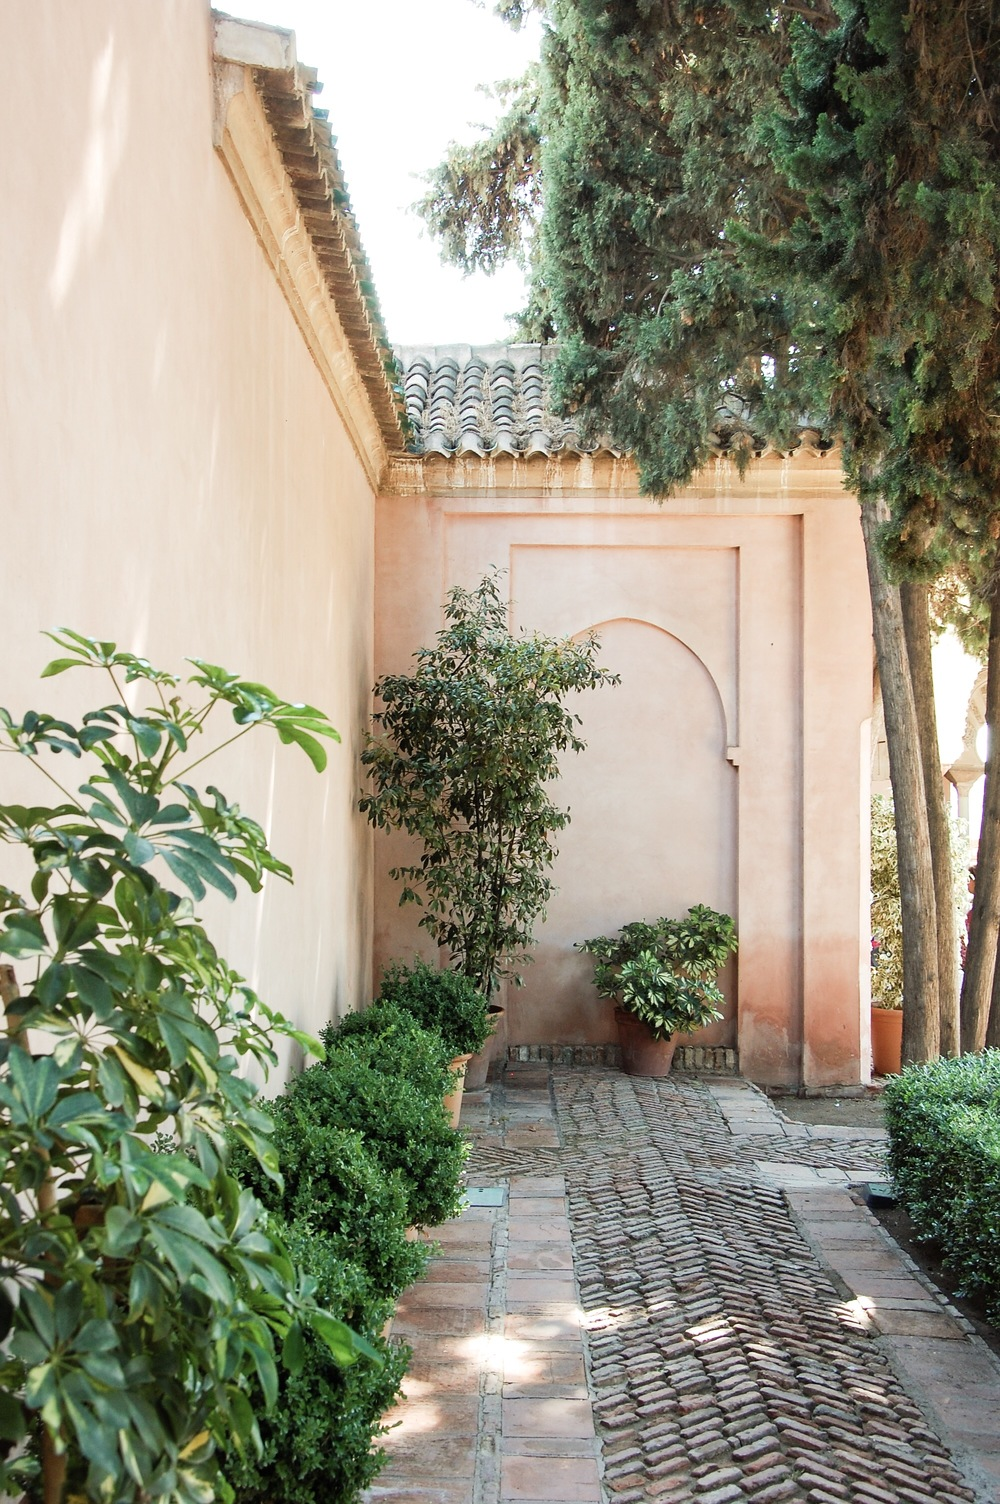 malaga-andalucia-spain-a-little-homesick-2.JPG